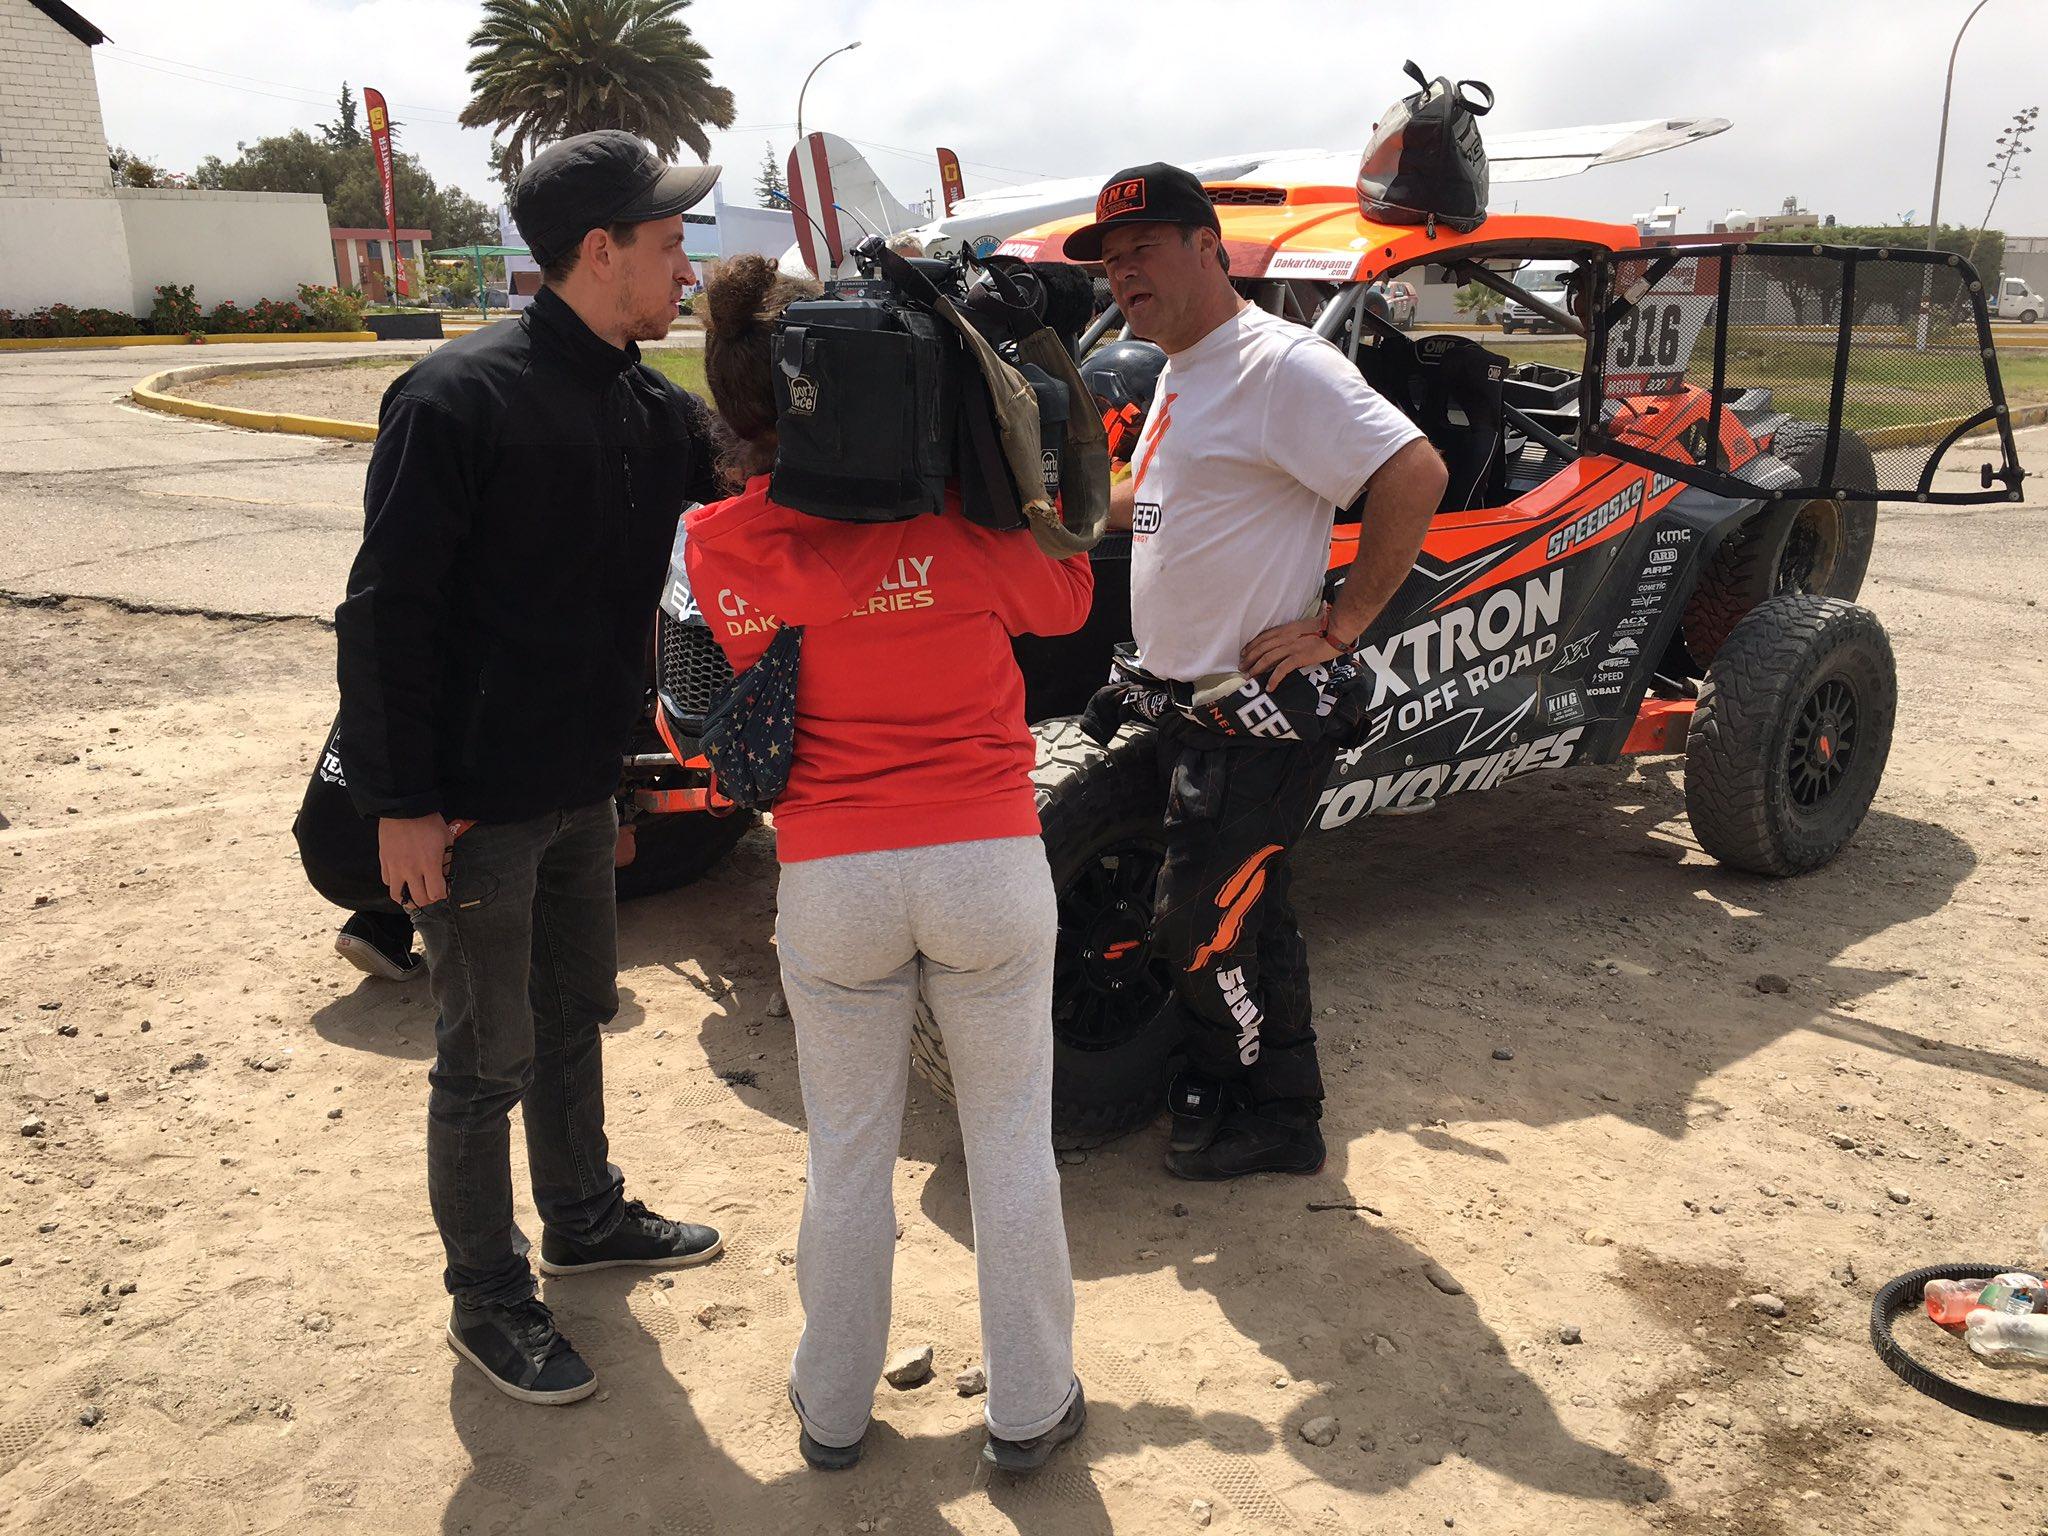 2019 41º Rallye Raid Dakar - Perú [6-17 Enero] - Página 7 DwjwmG-UwAAtzBC